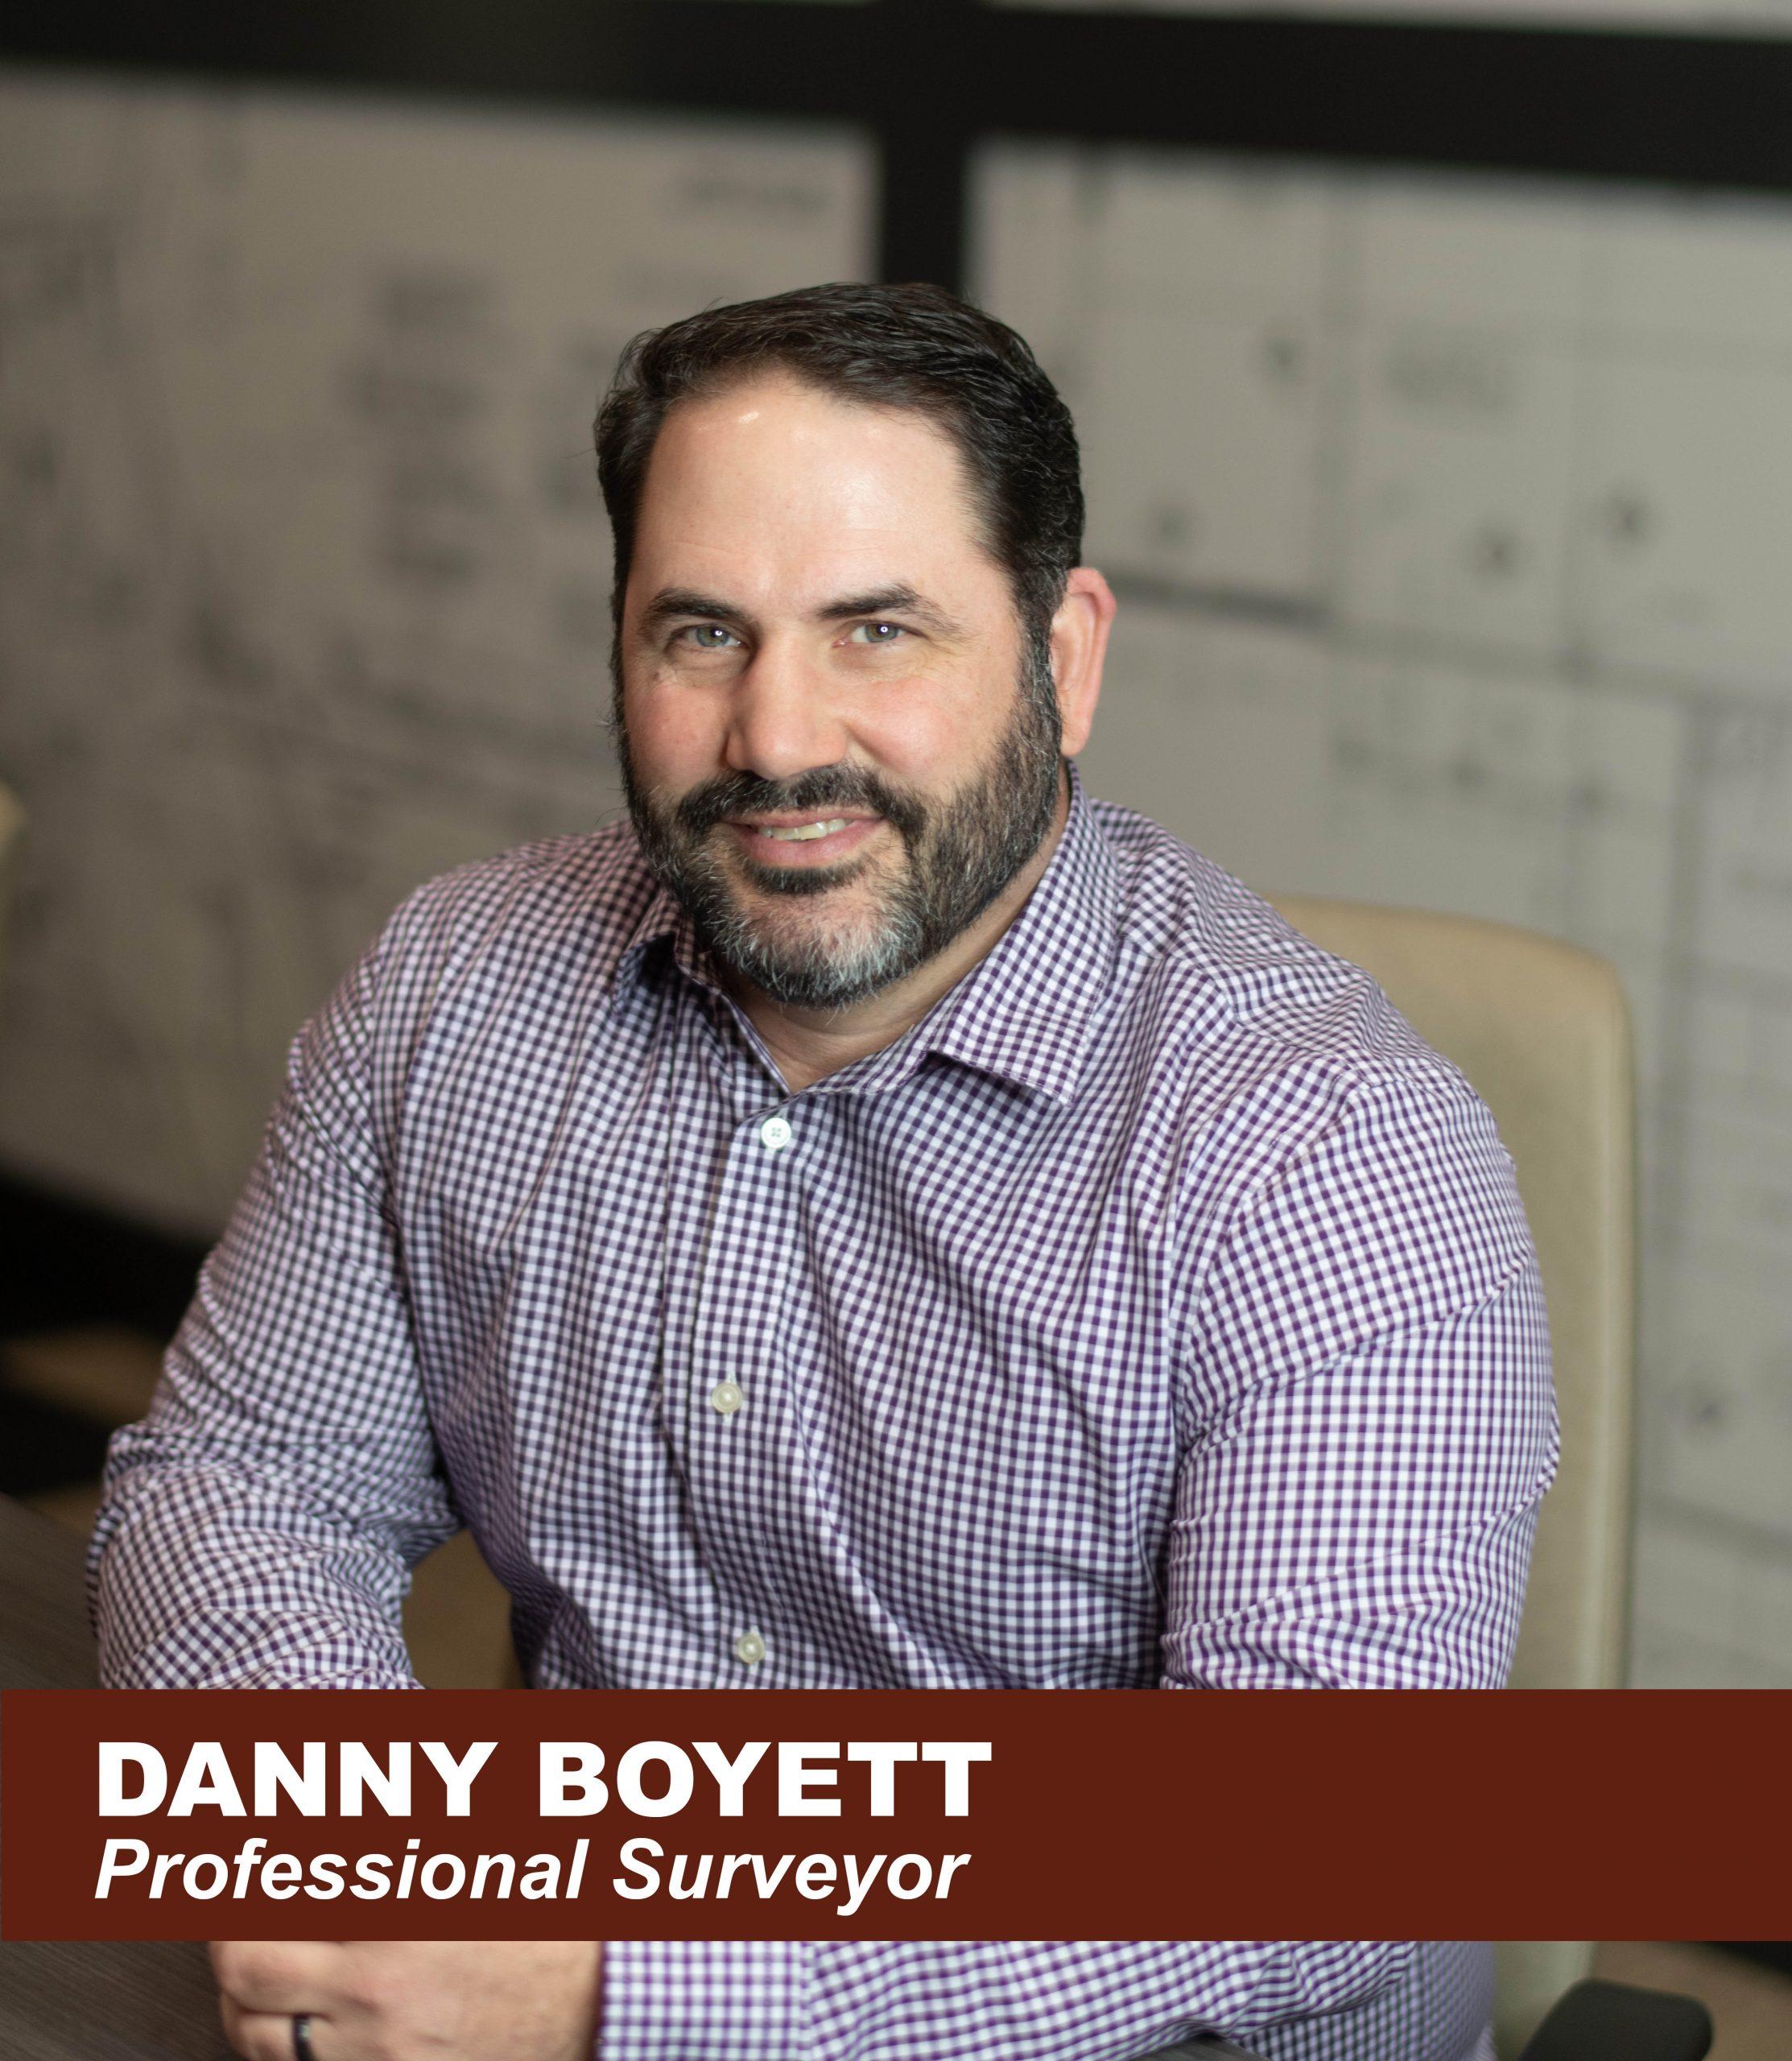 Danny Boyett